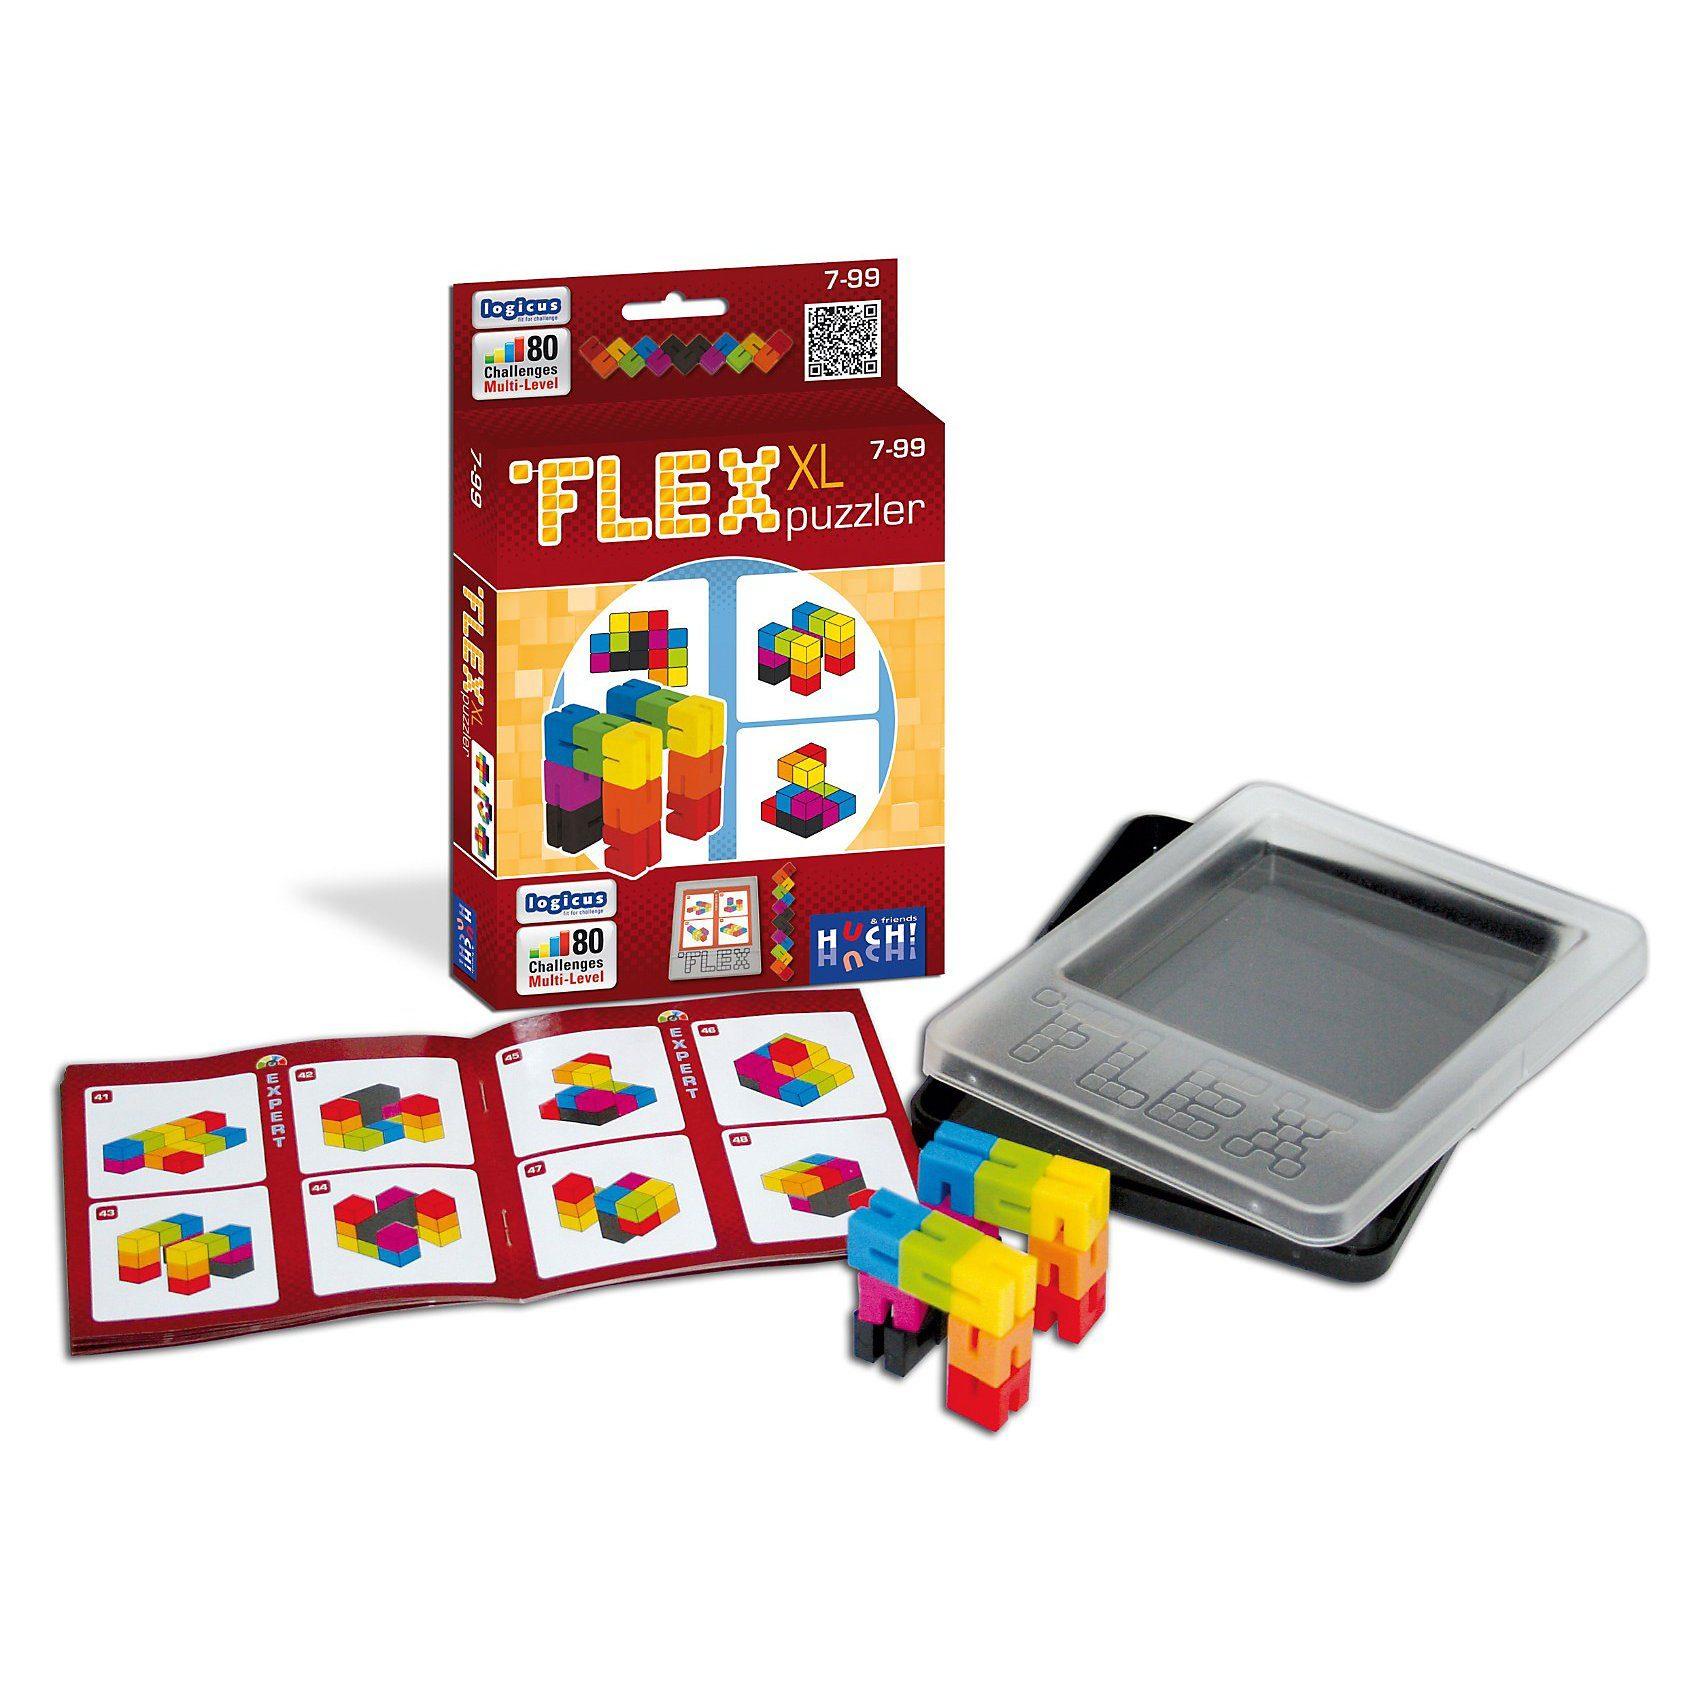 HUCH! & friends Flex Puzzler XL